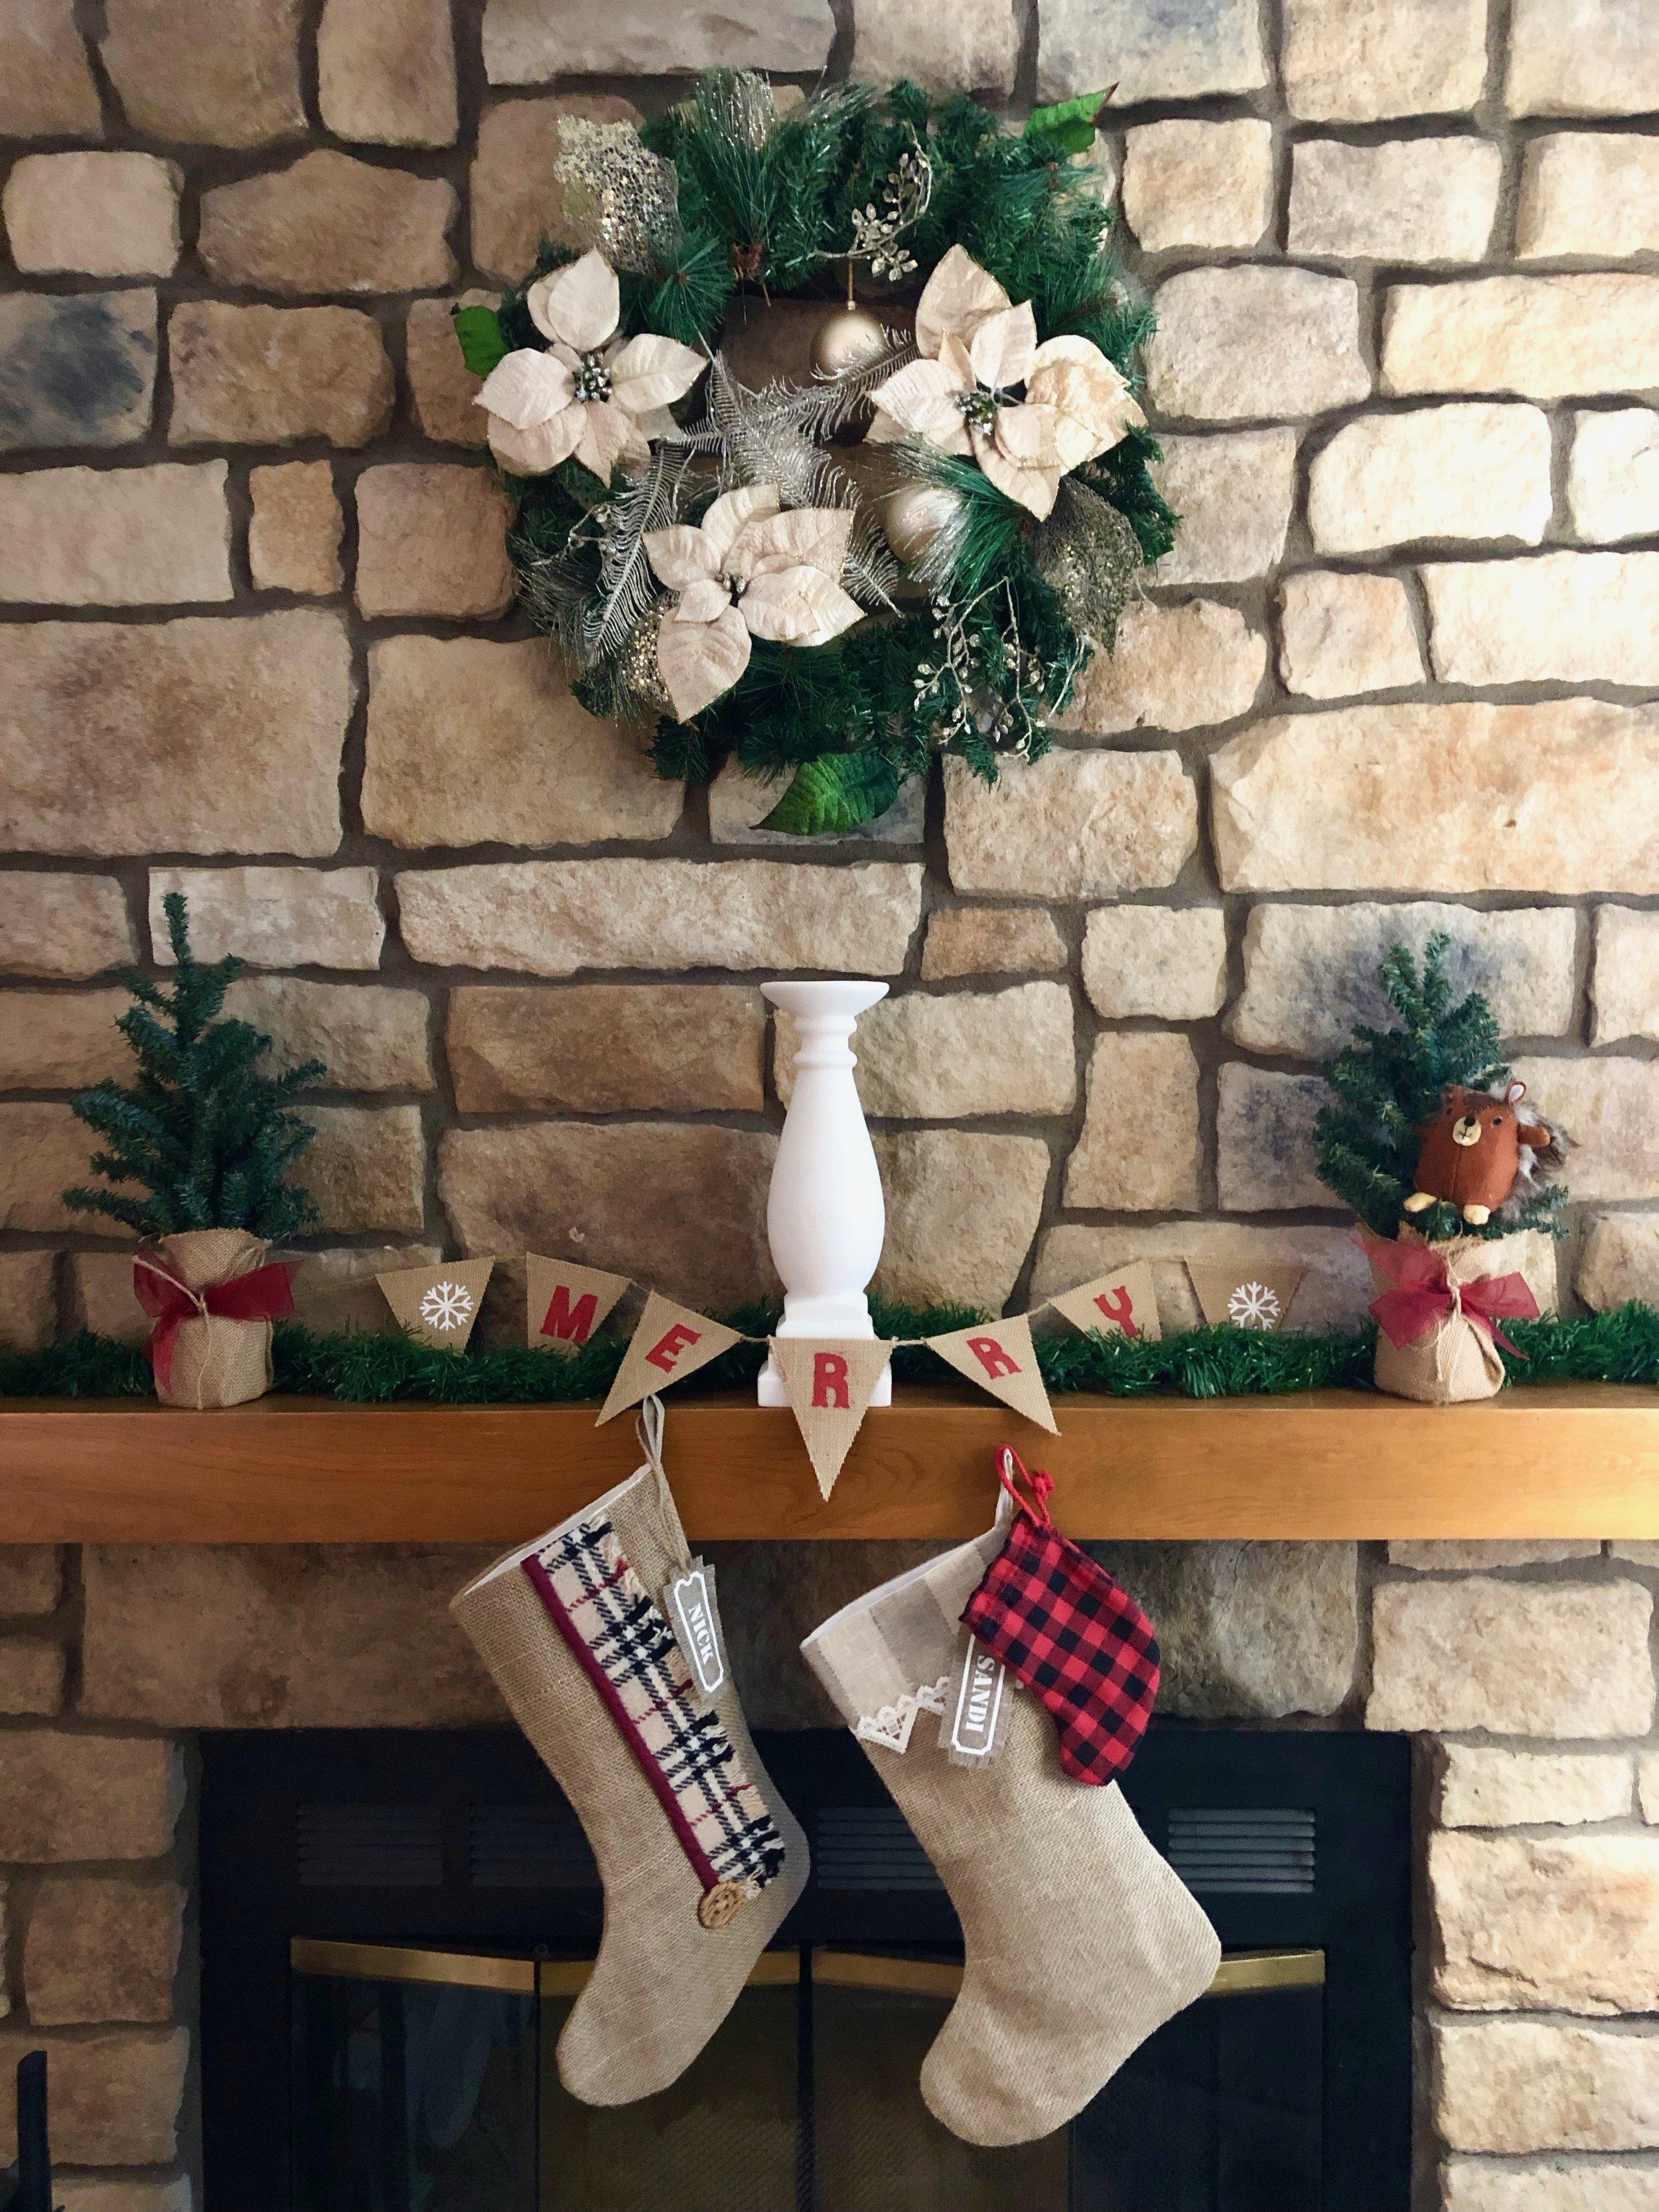 Miniature stocking announcement - Denver personal stylist